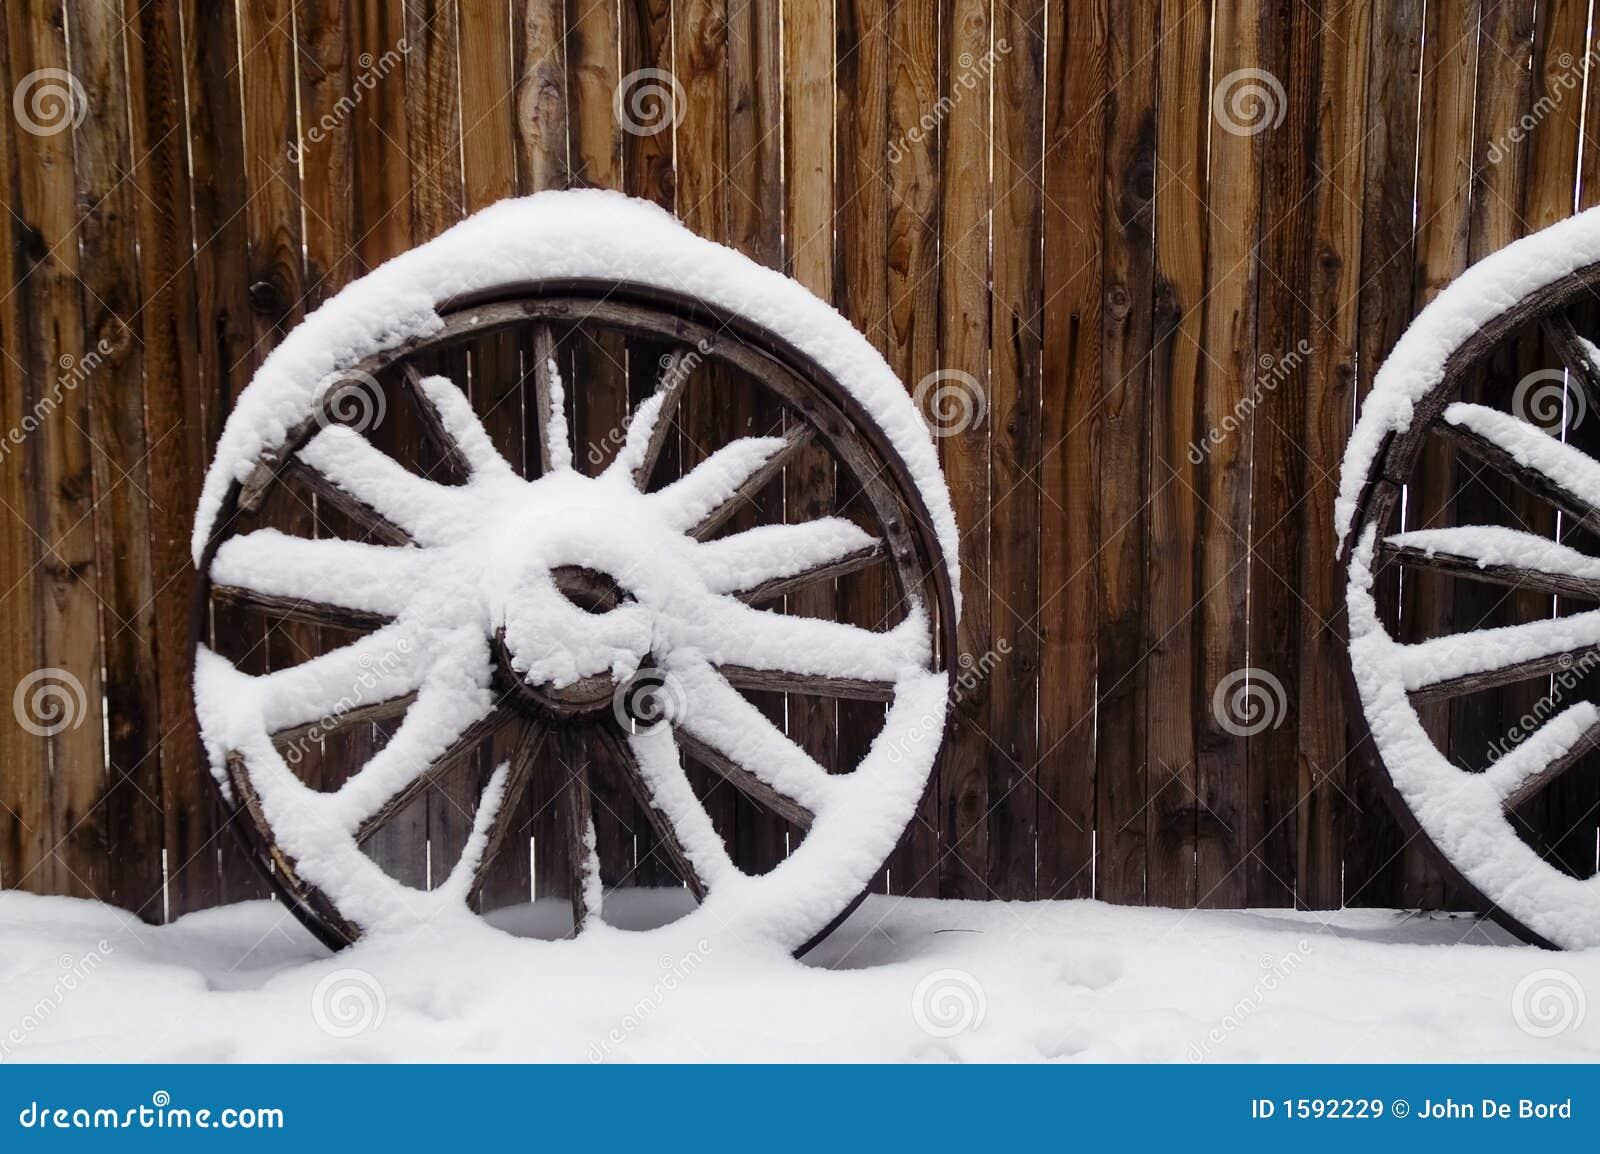 Antique Wagon Wheels in Snow